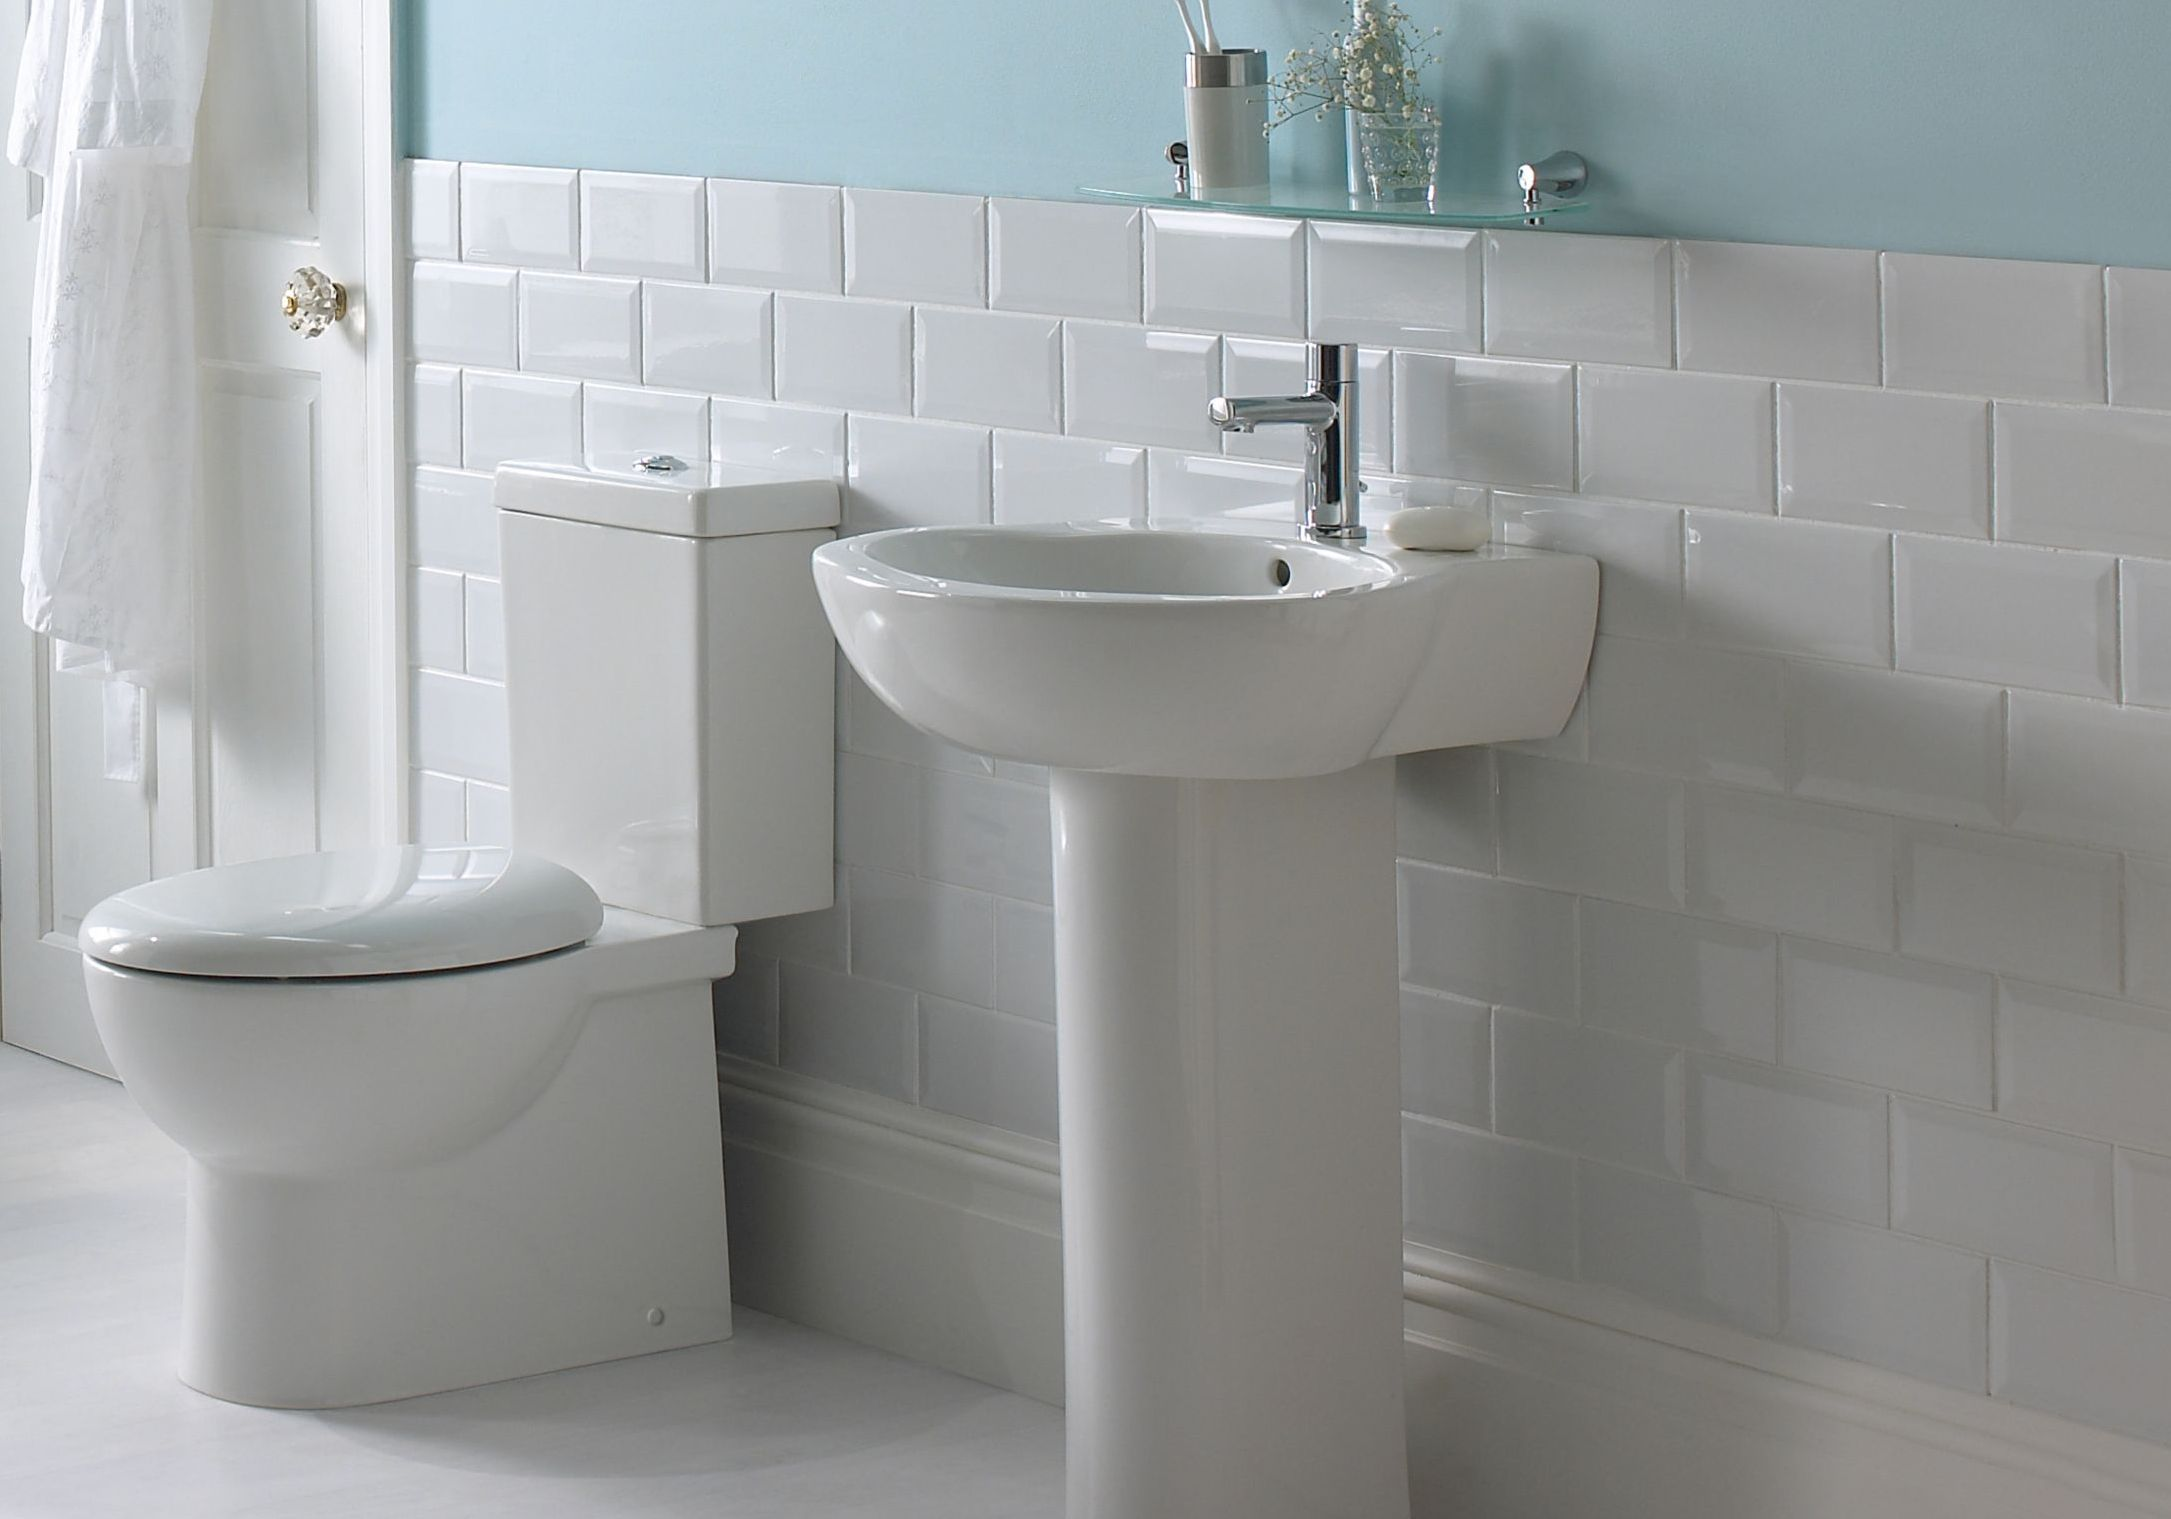 Tiling Bathroom bathroom shower and tub wall tile. bathroom wall tile green and